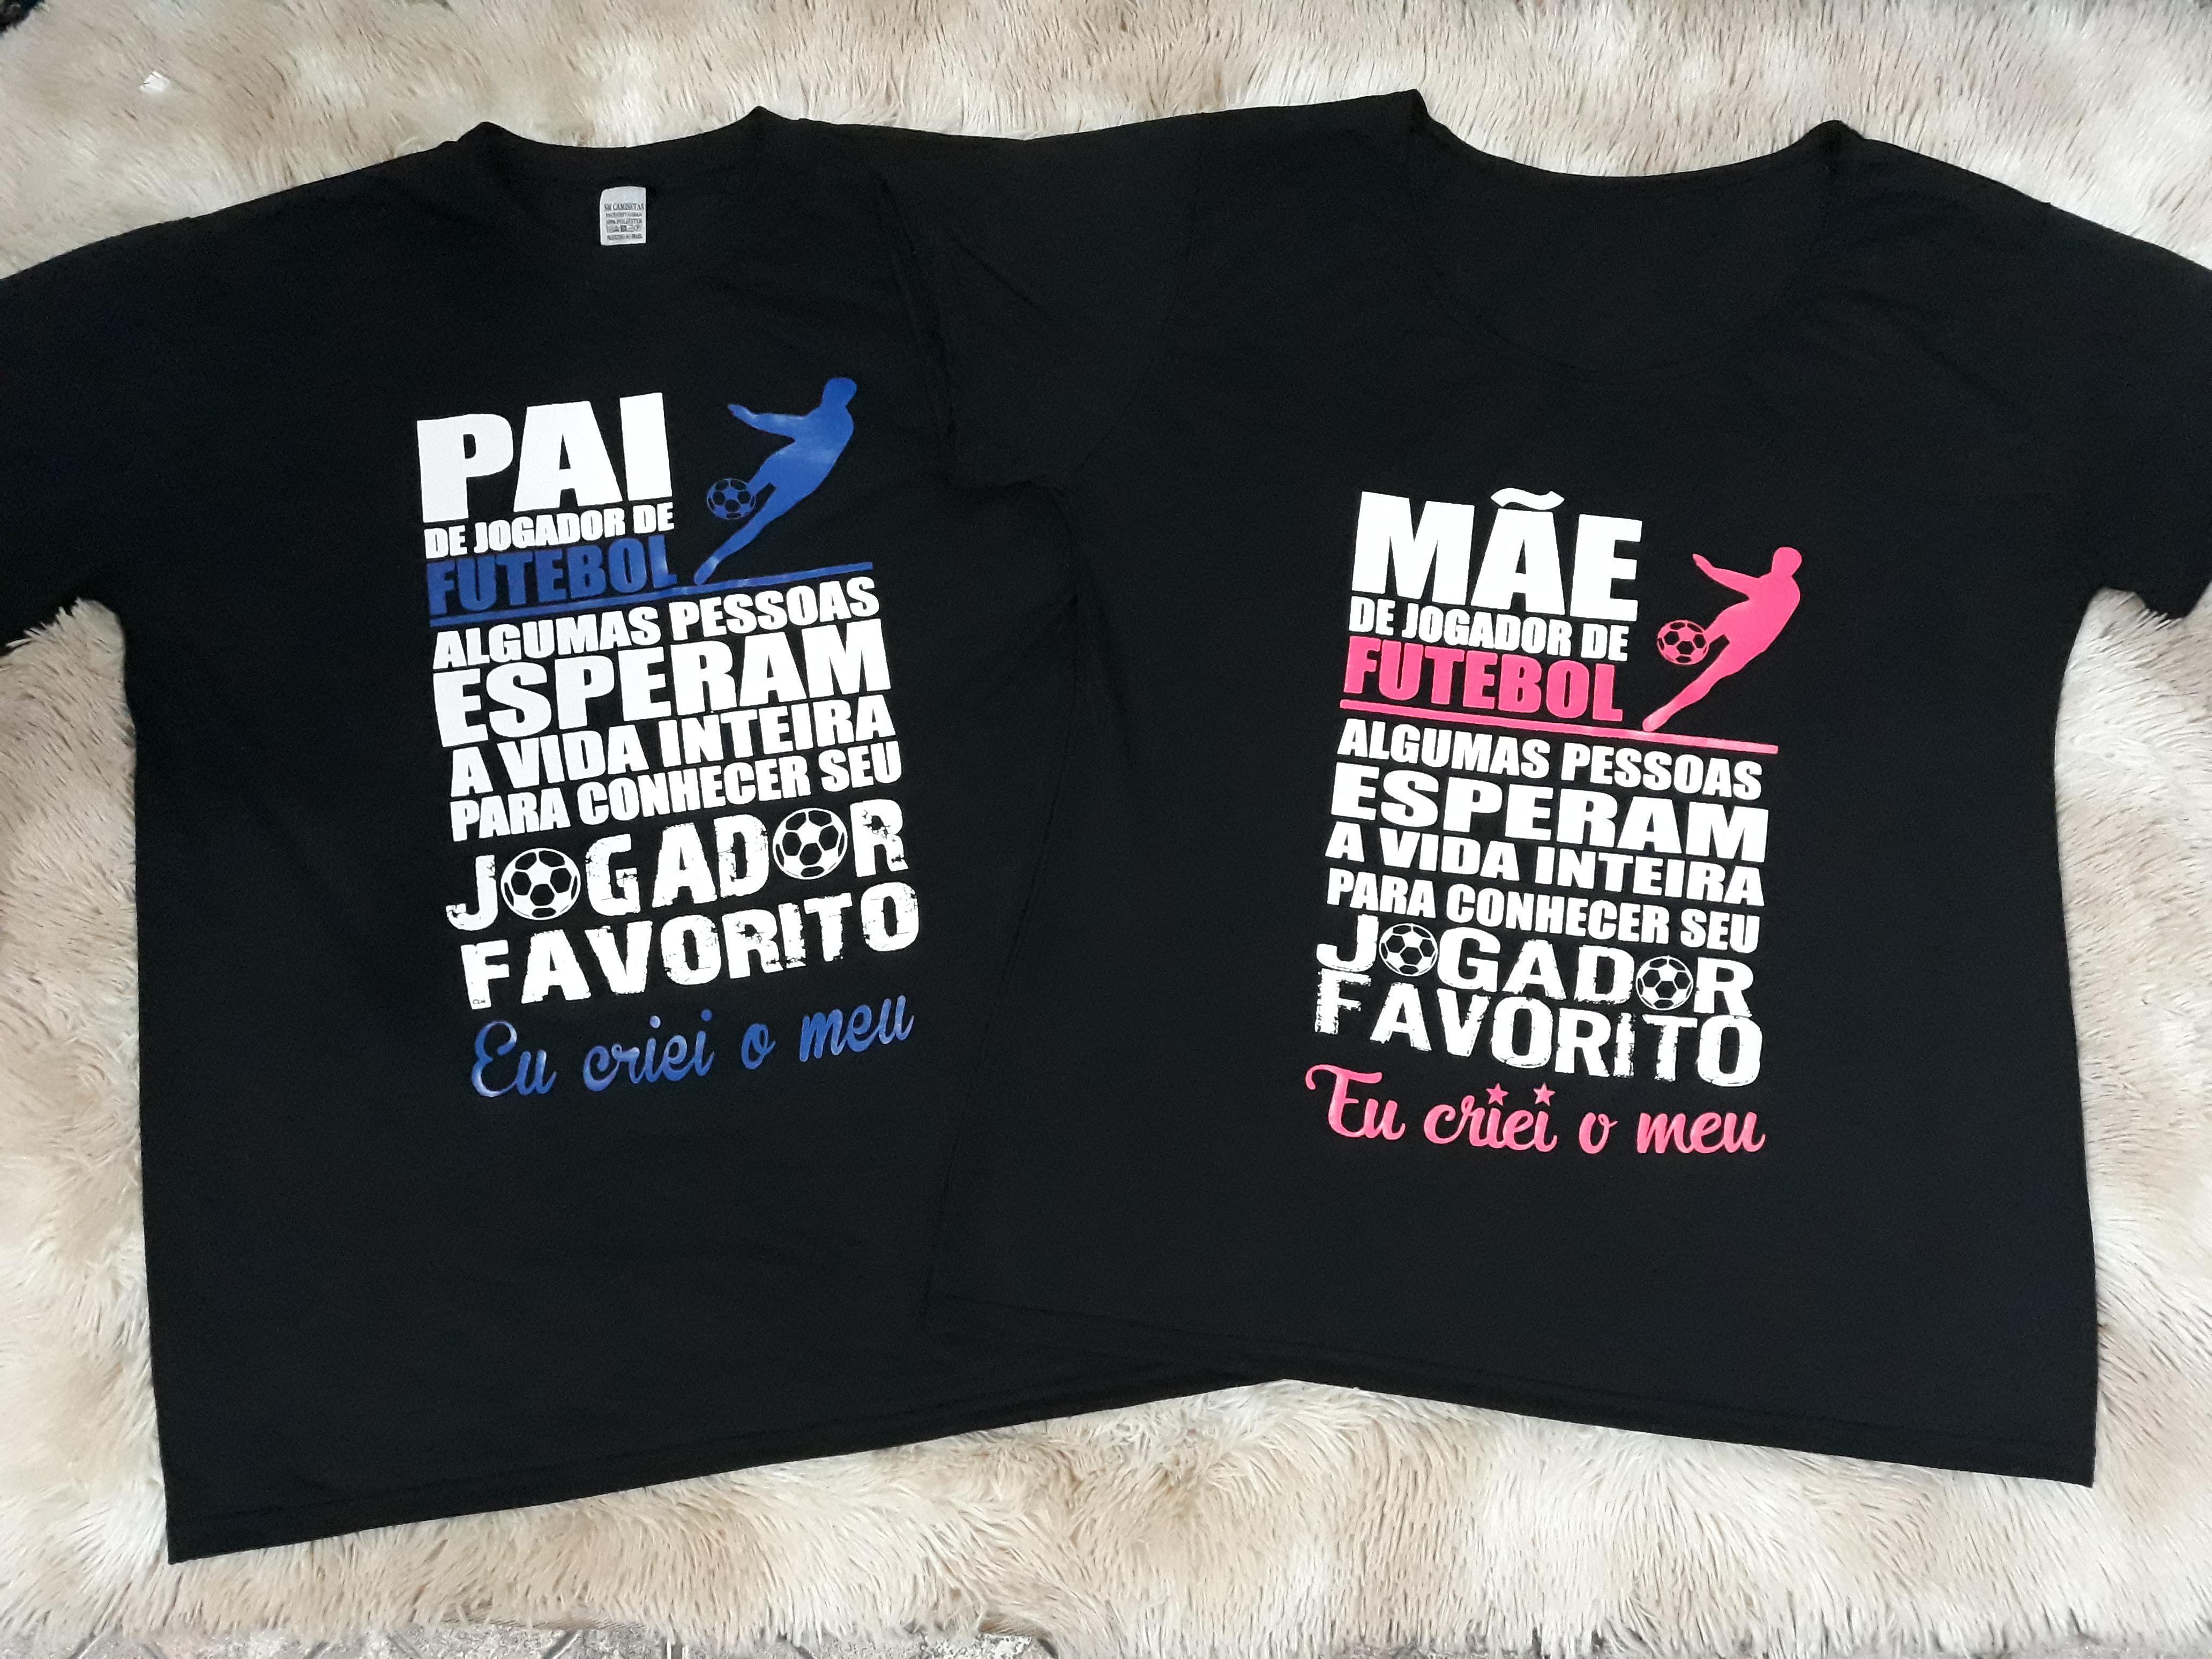 5a9601fc48 Camiseta Futebol Messi Regata